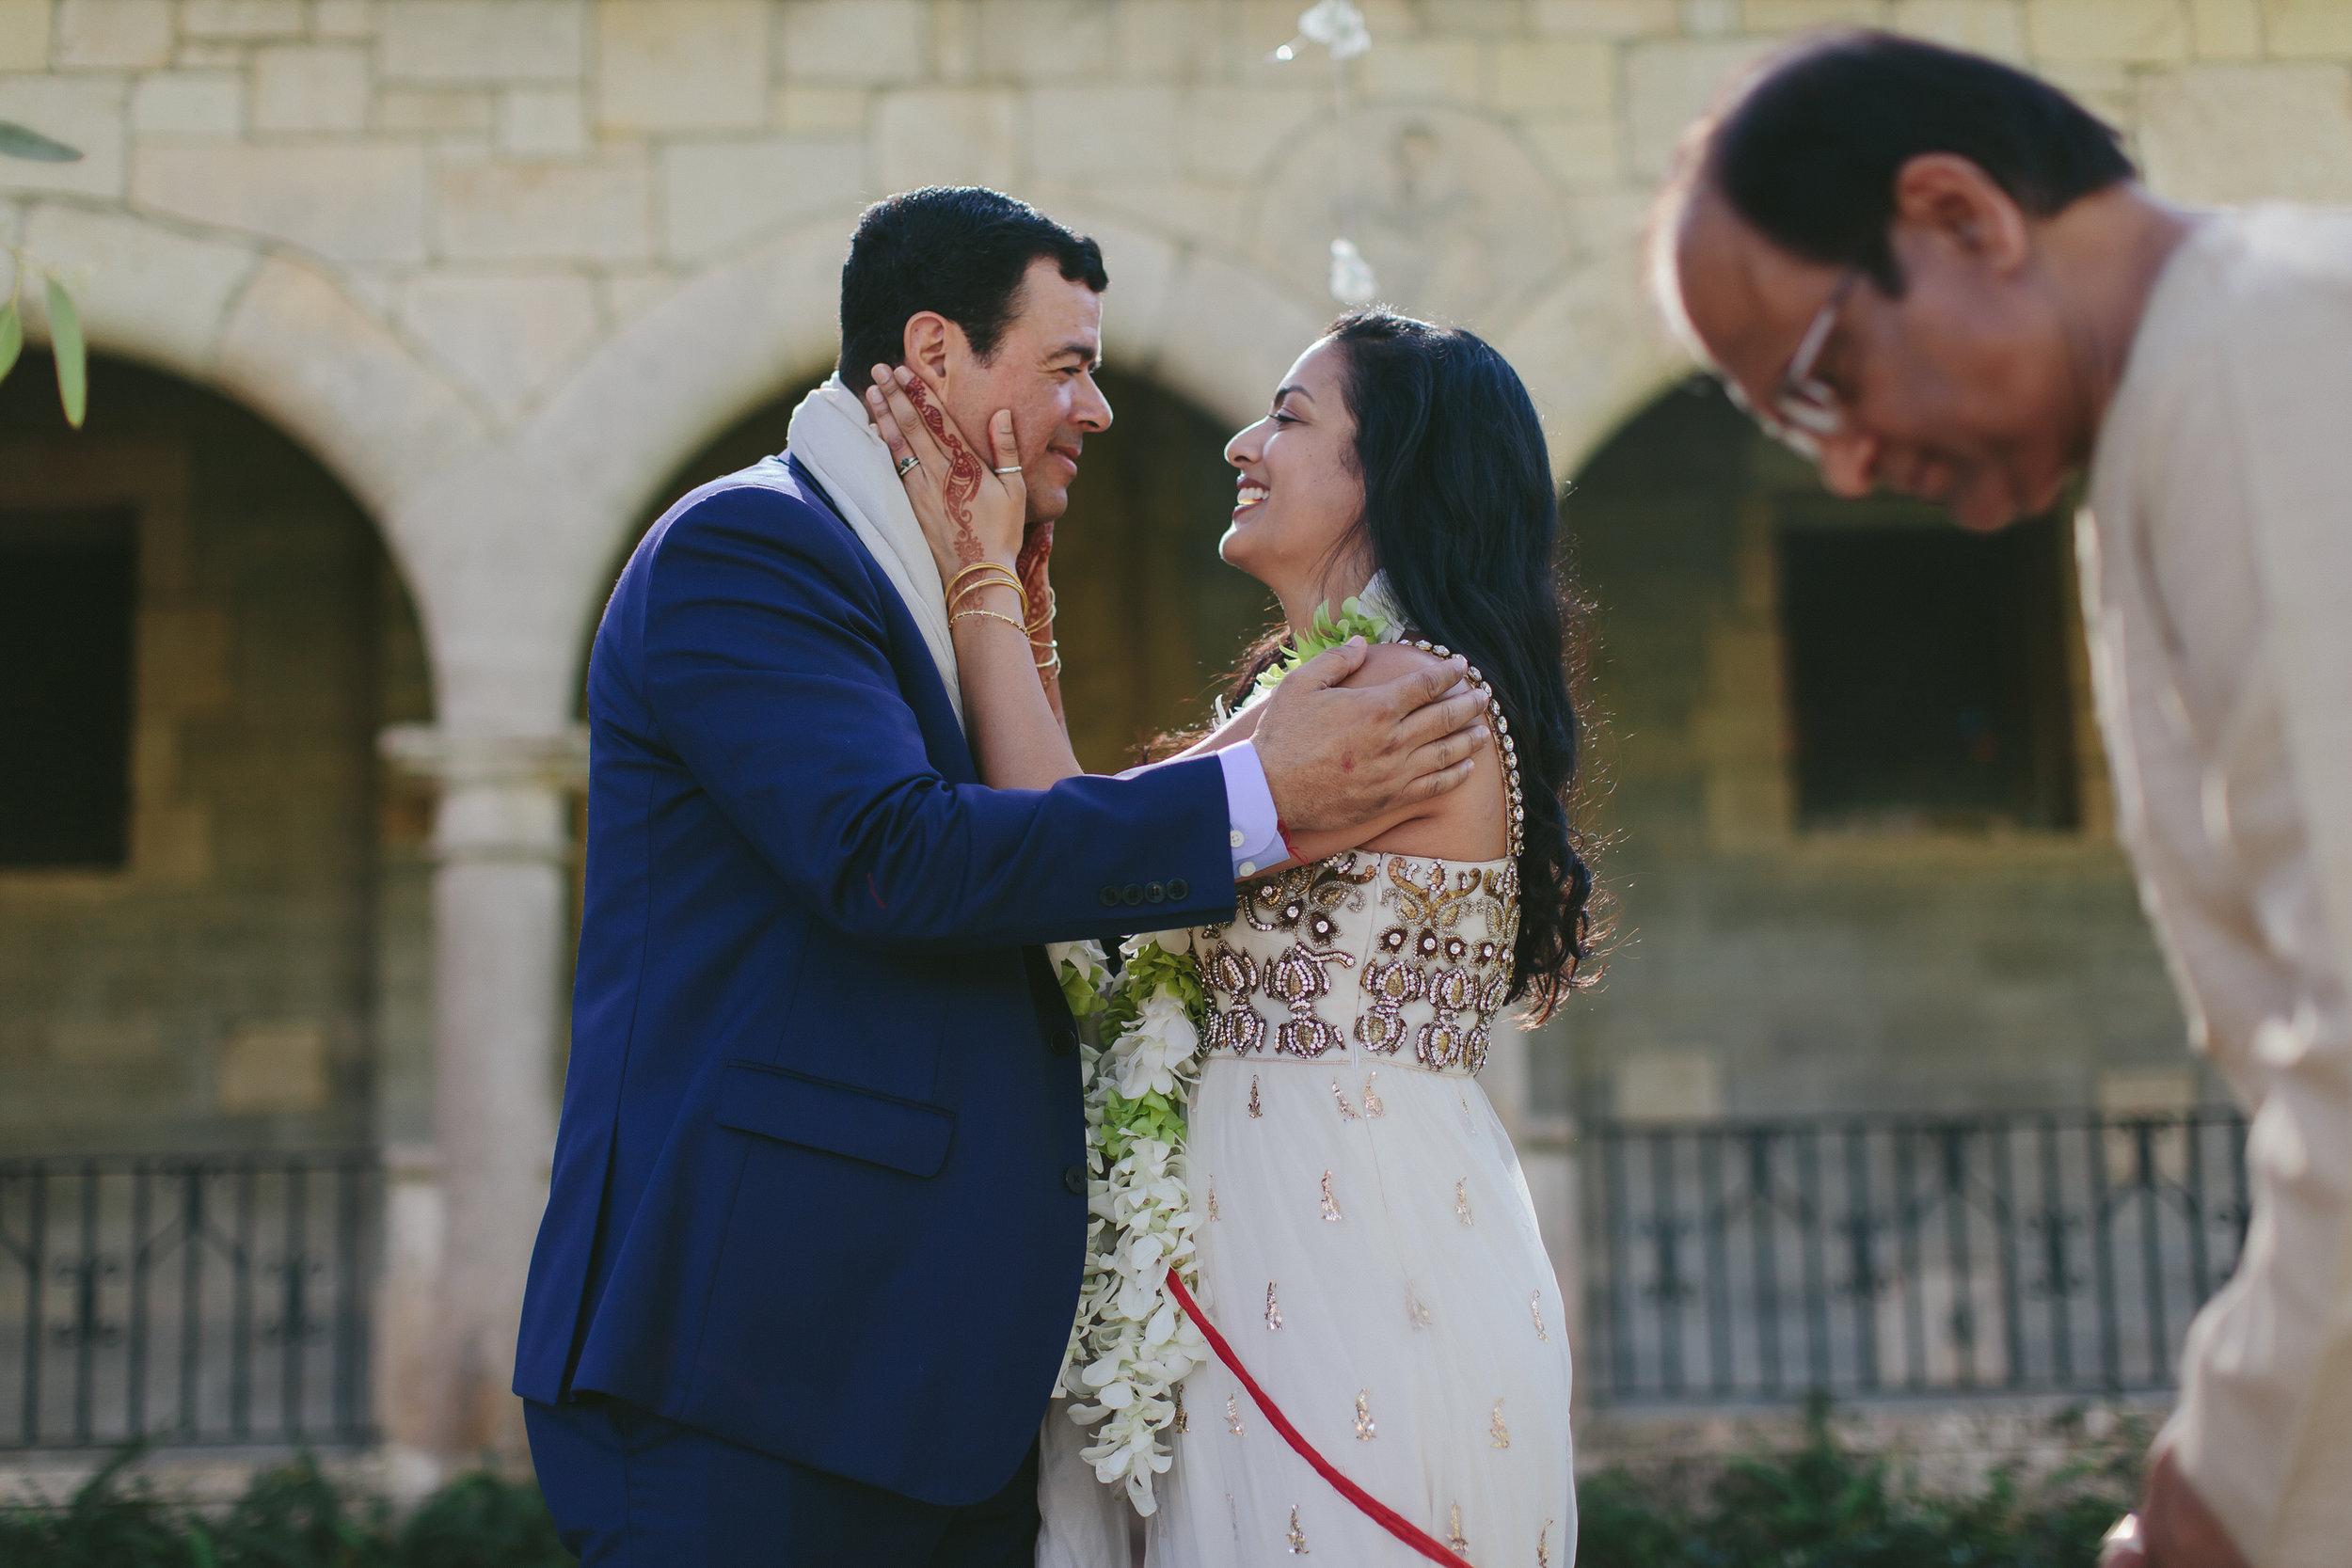 kiss-the-bride-indian-wedding-tiny-house-photo.jpg